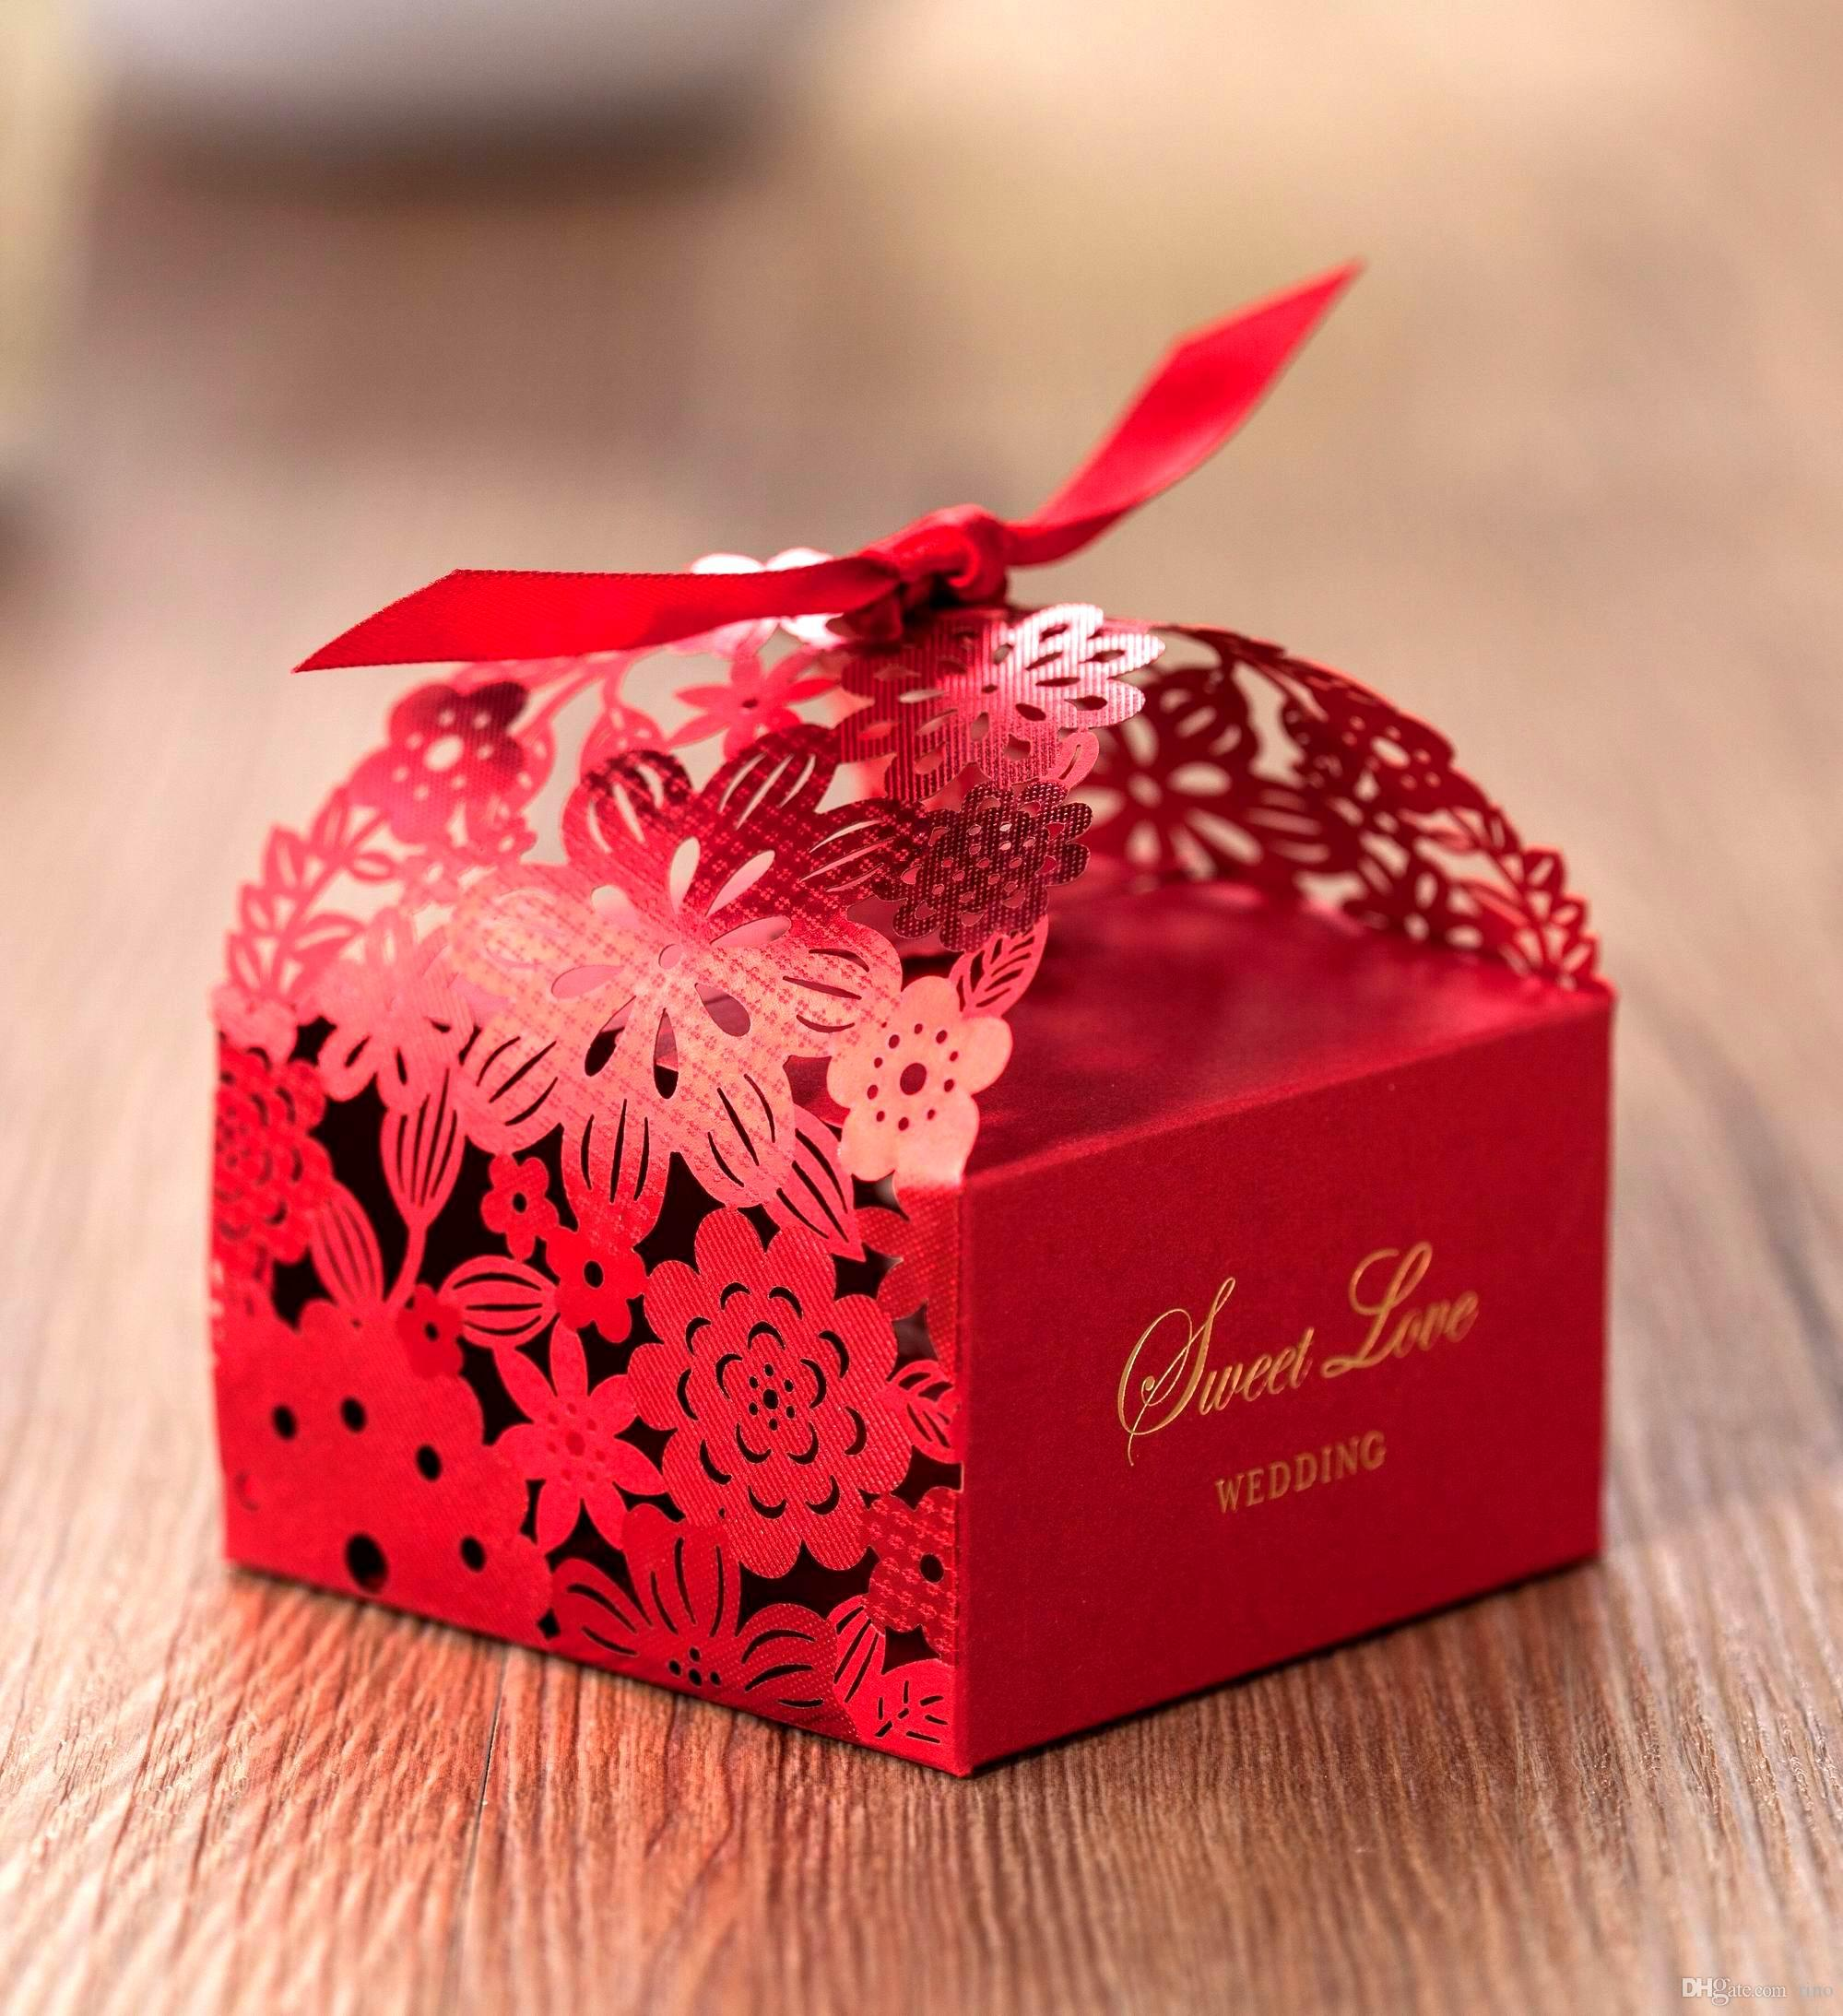 Creative Weding Gift Ideas 02 - Creative Weding Gift Ideas